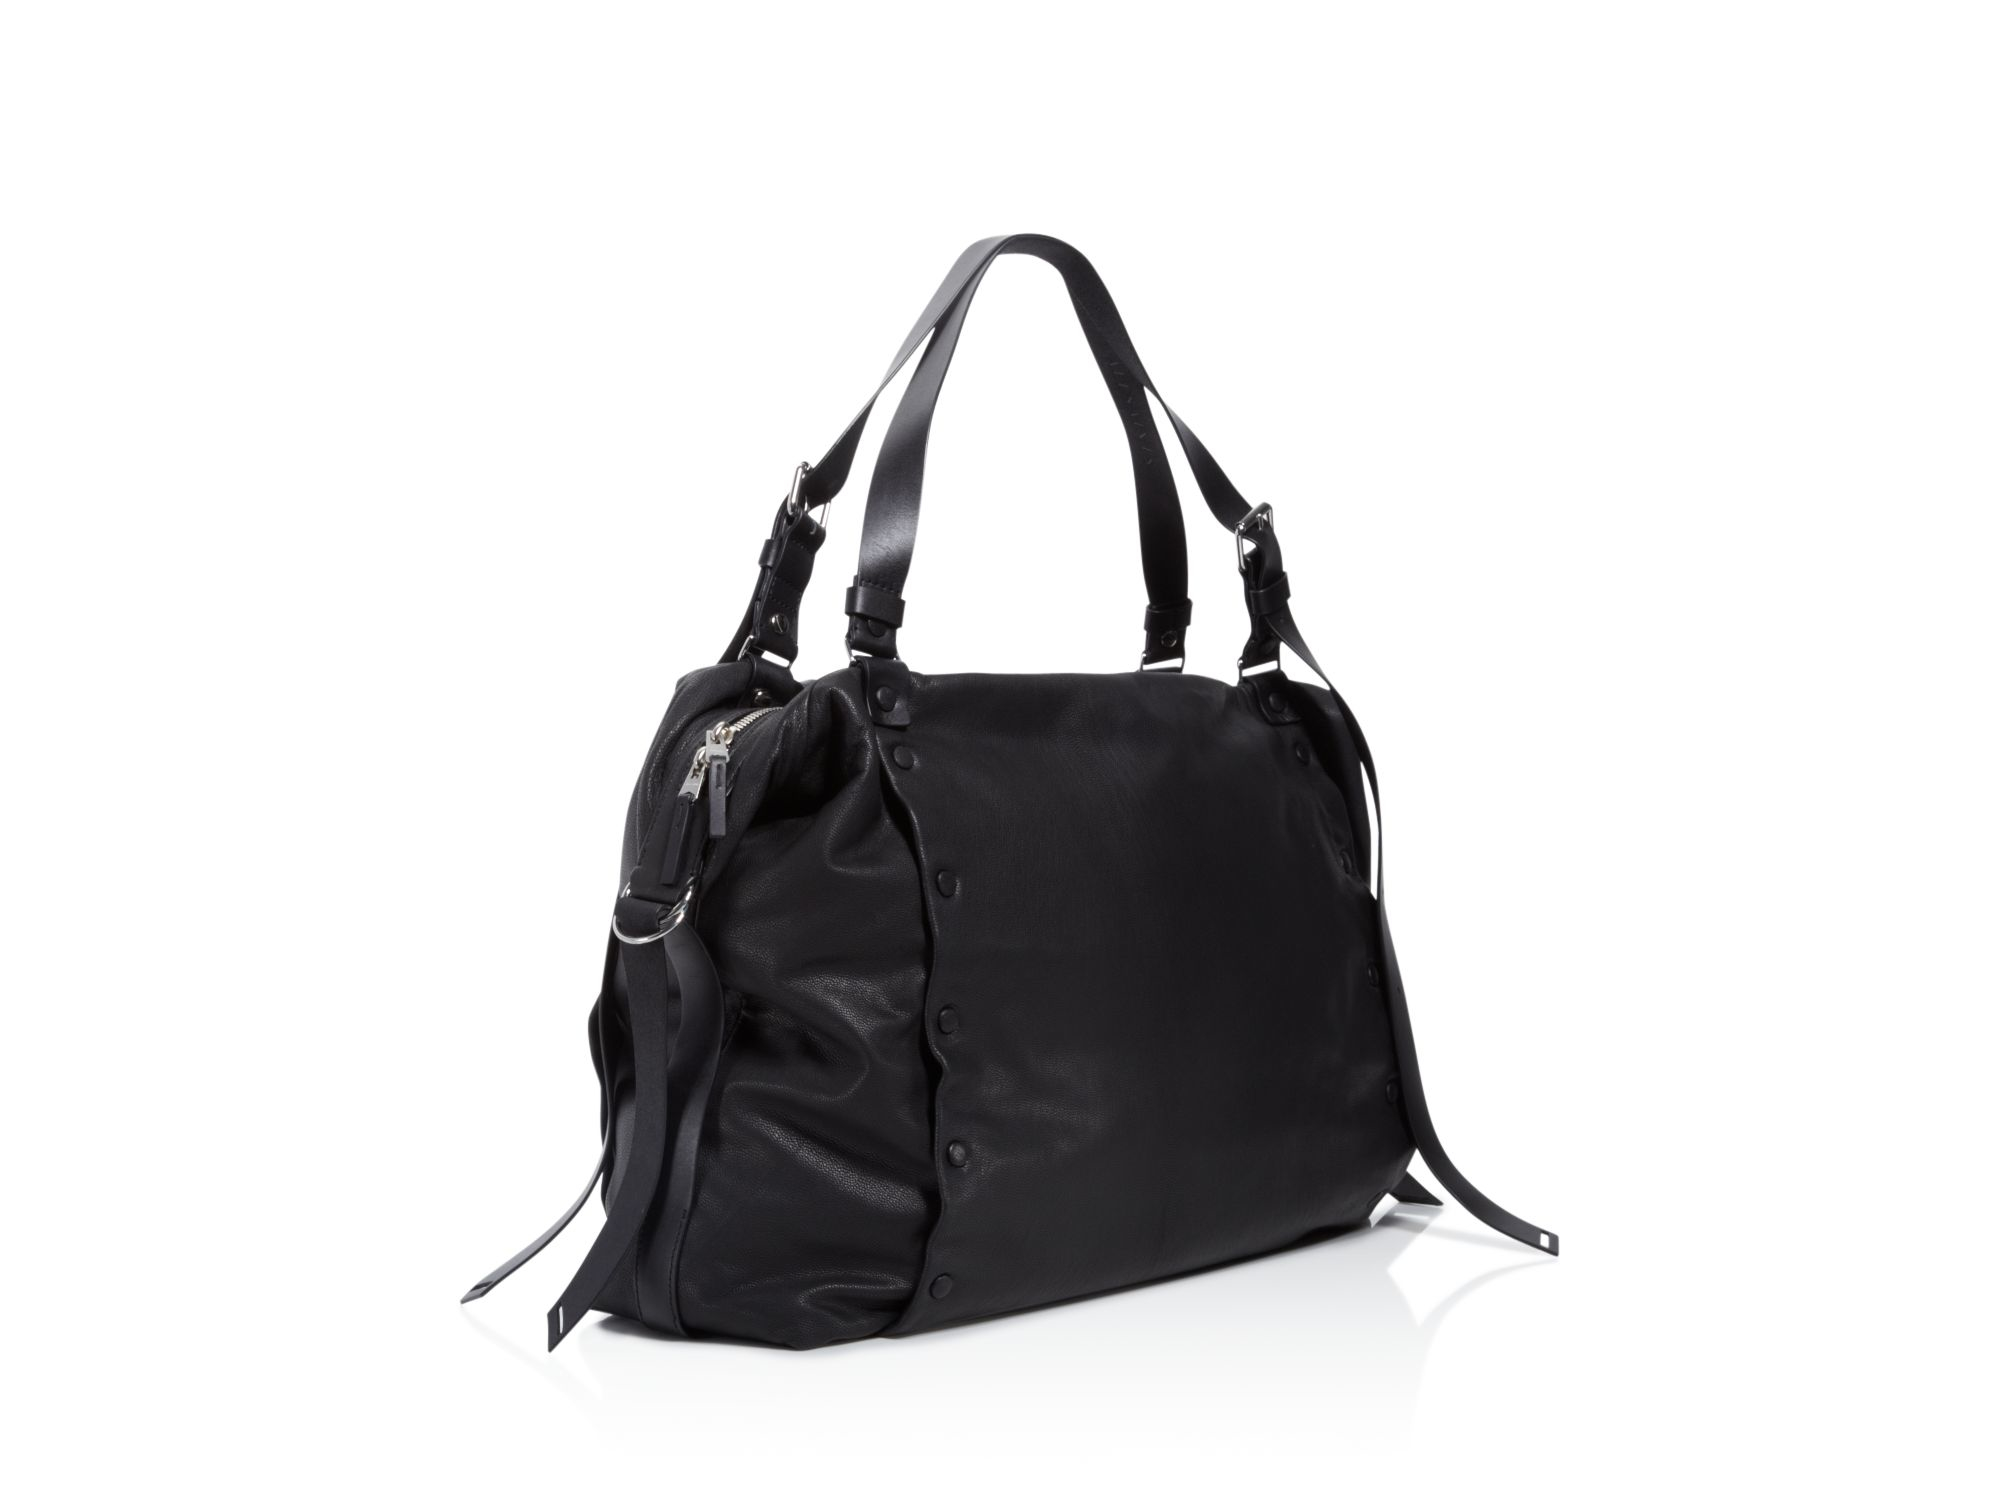 1b62b88a571f AllSaints Darling Large Bowling Bag Satchel in Black - Lyst